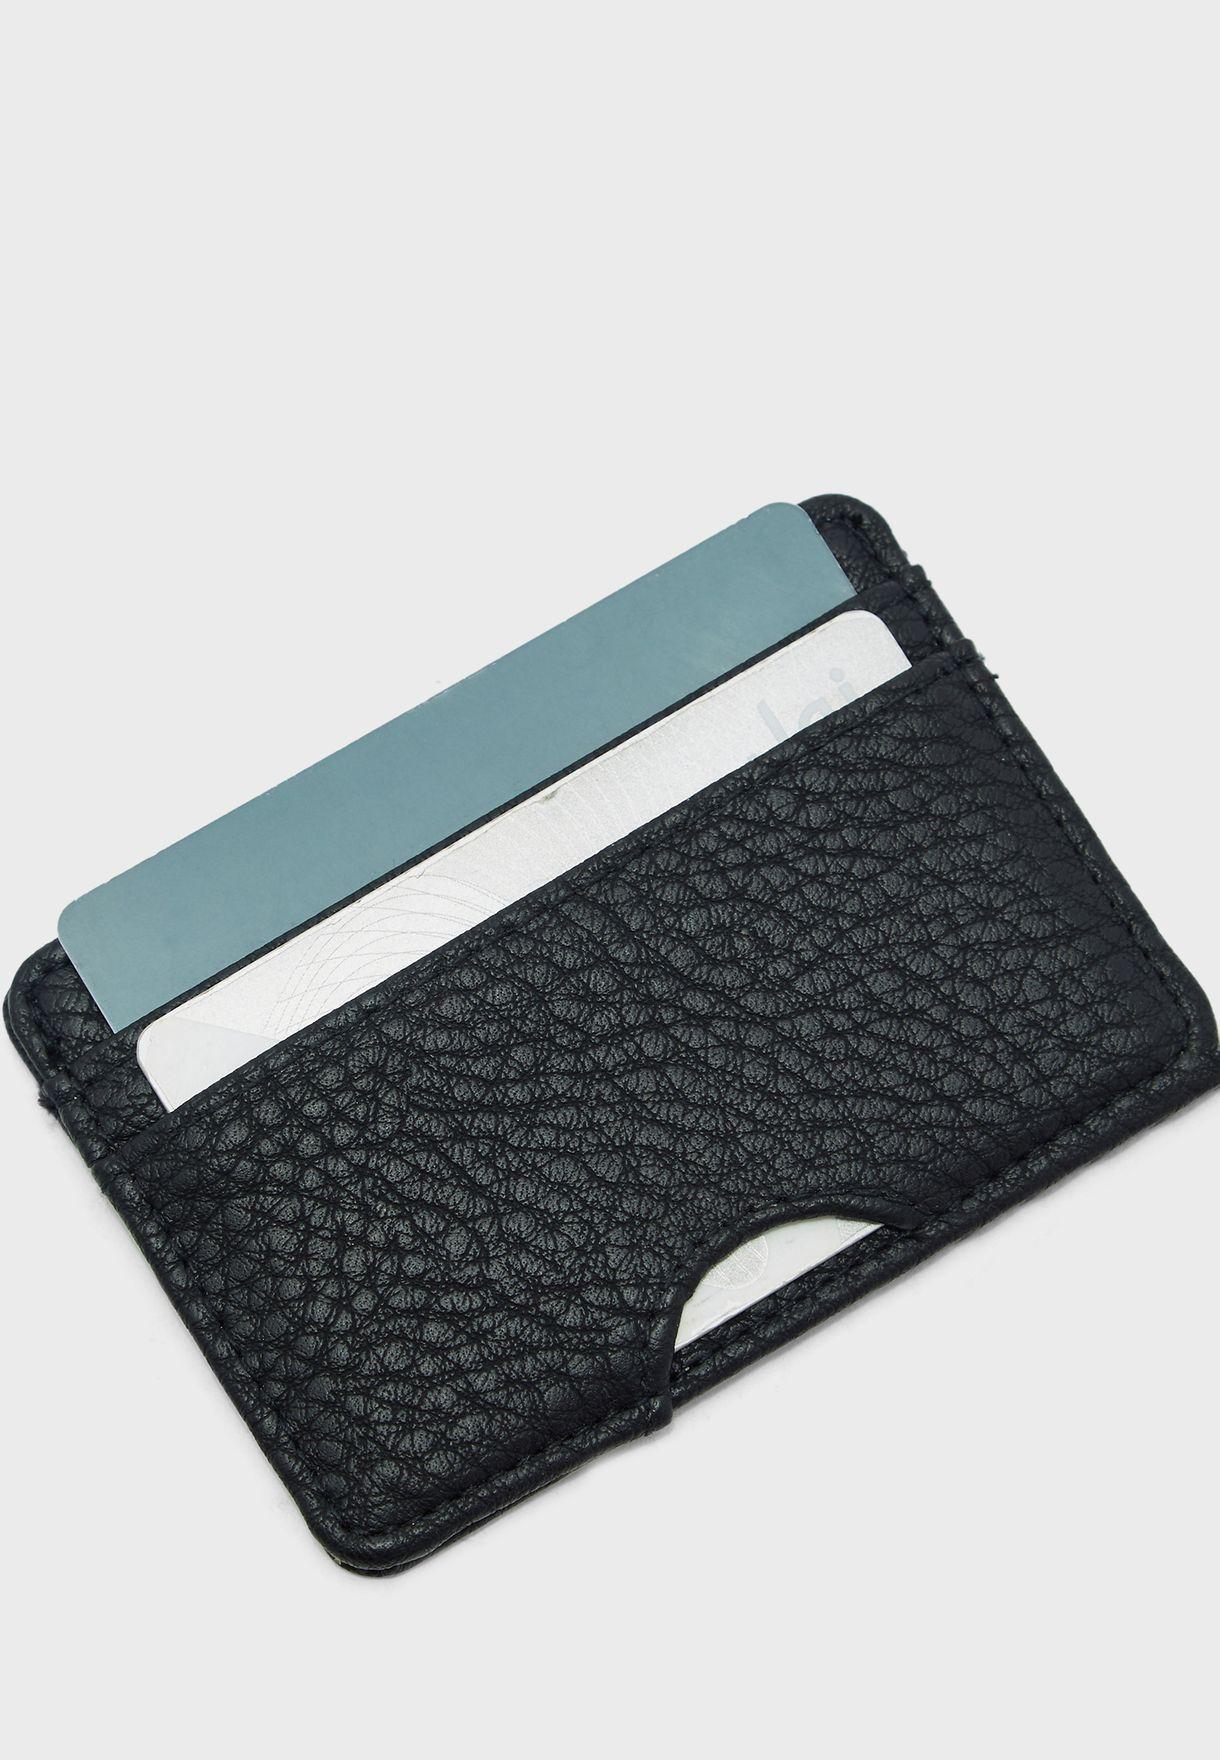 Textured Card Holder